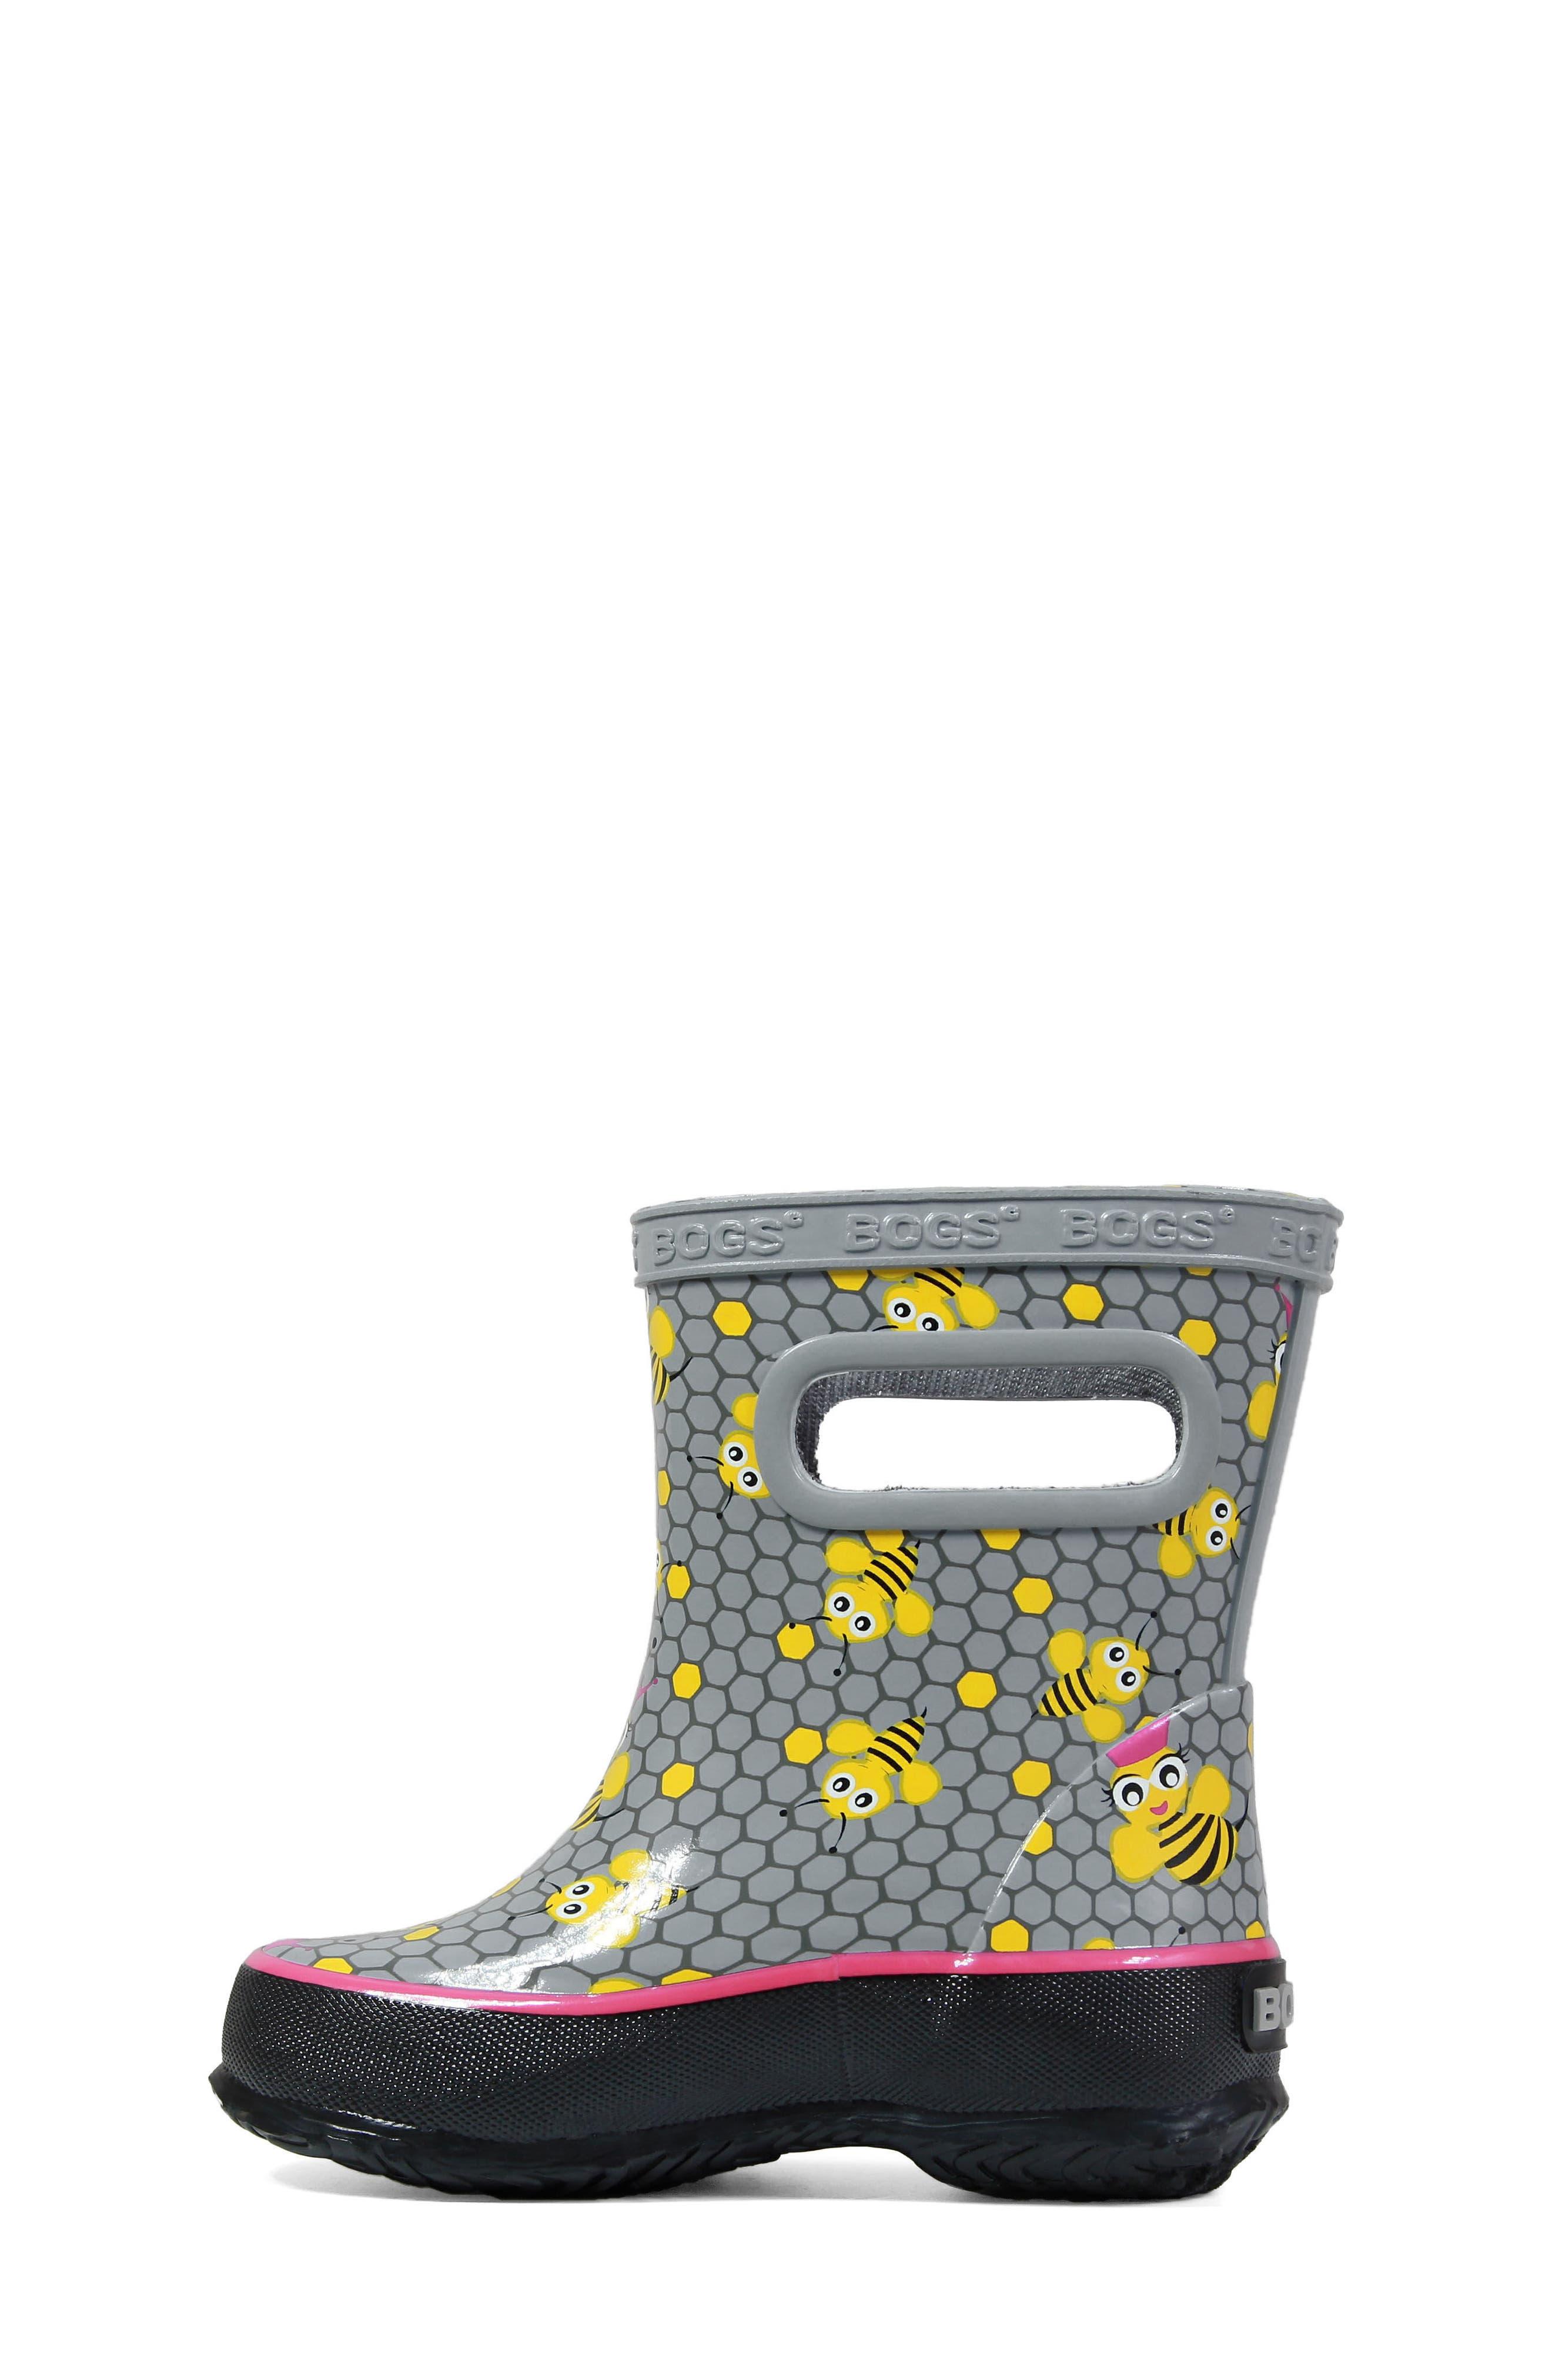 Skipper Bees Rubber Rain Boot,                             Alternate thumbnail 3, color,                             GRAY MULTI